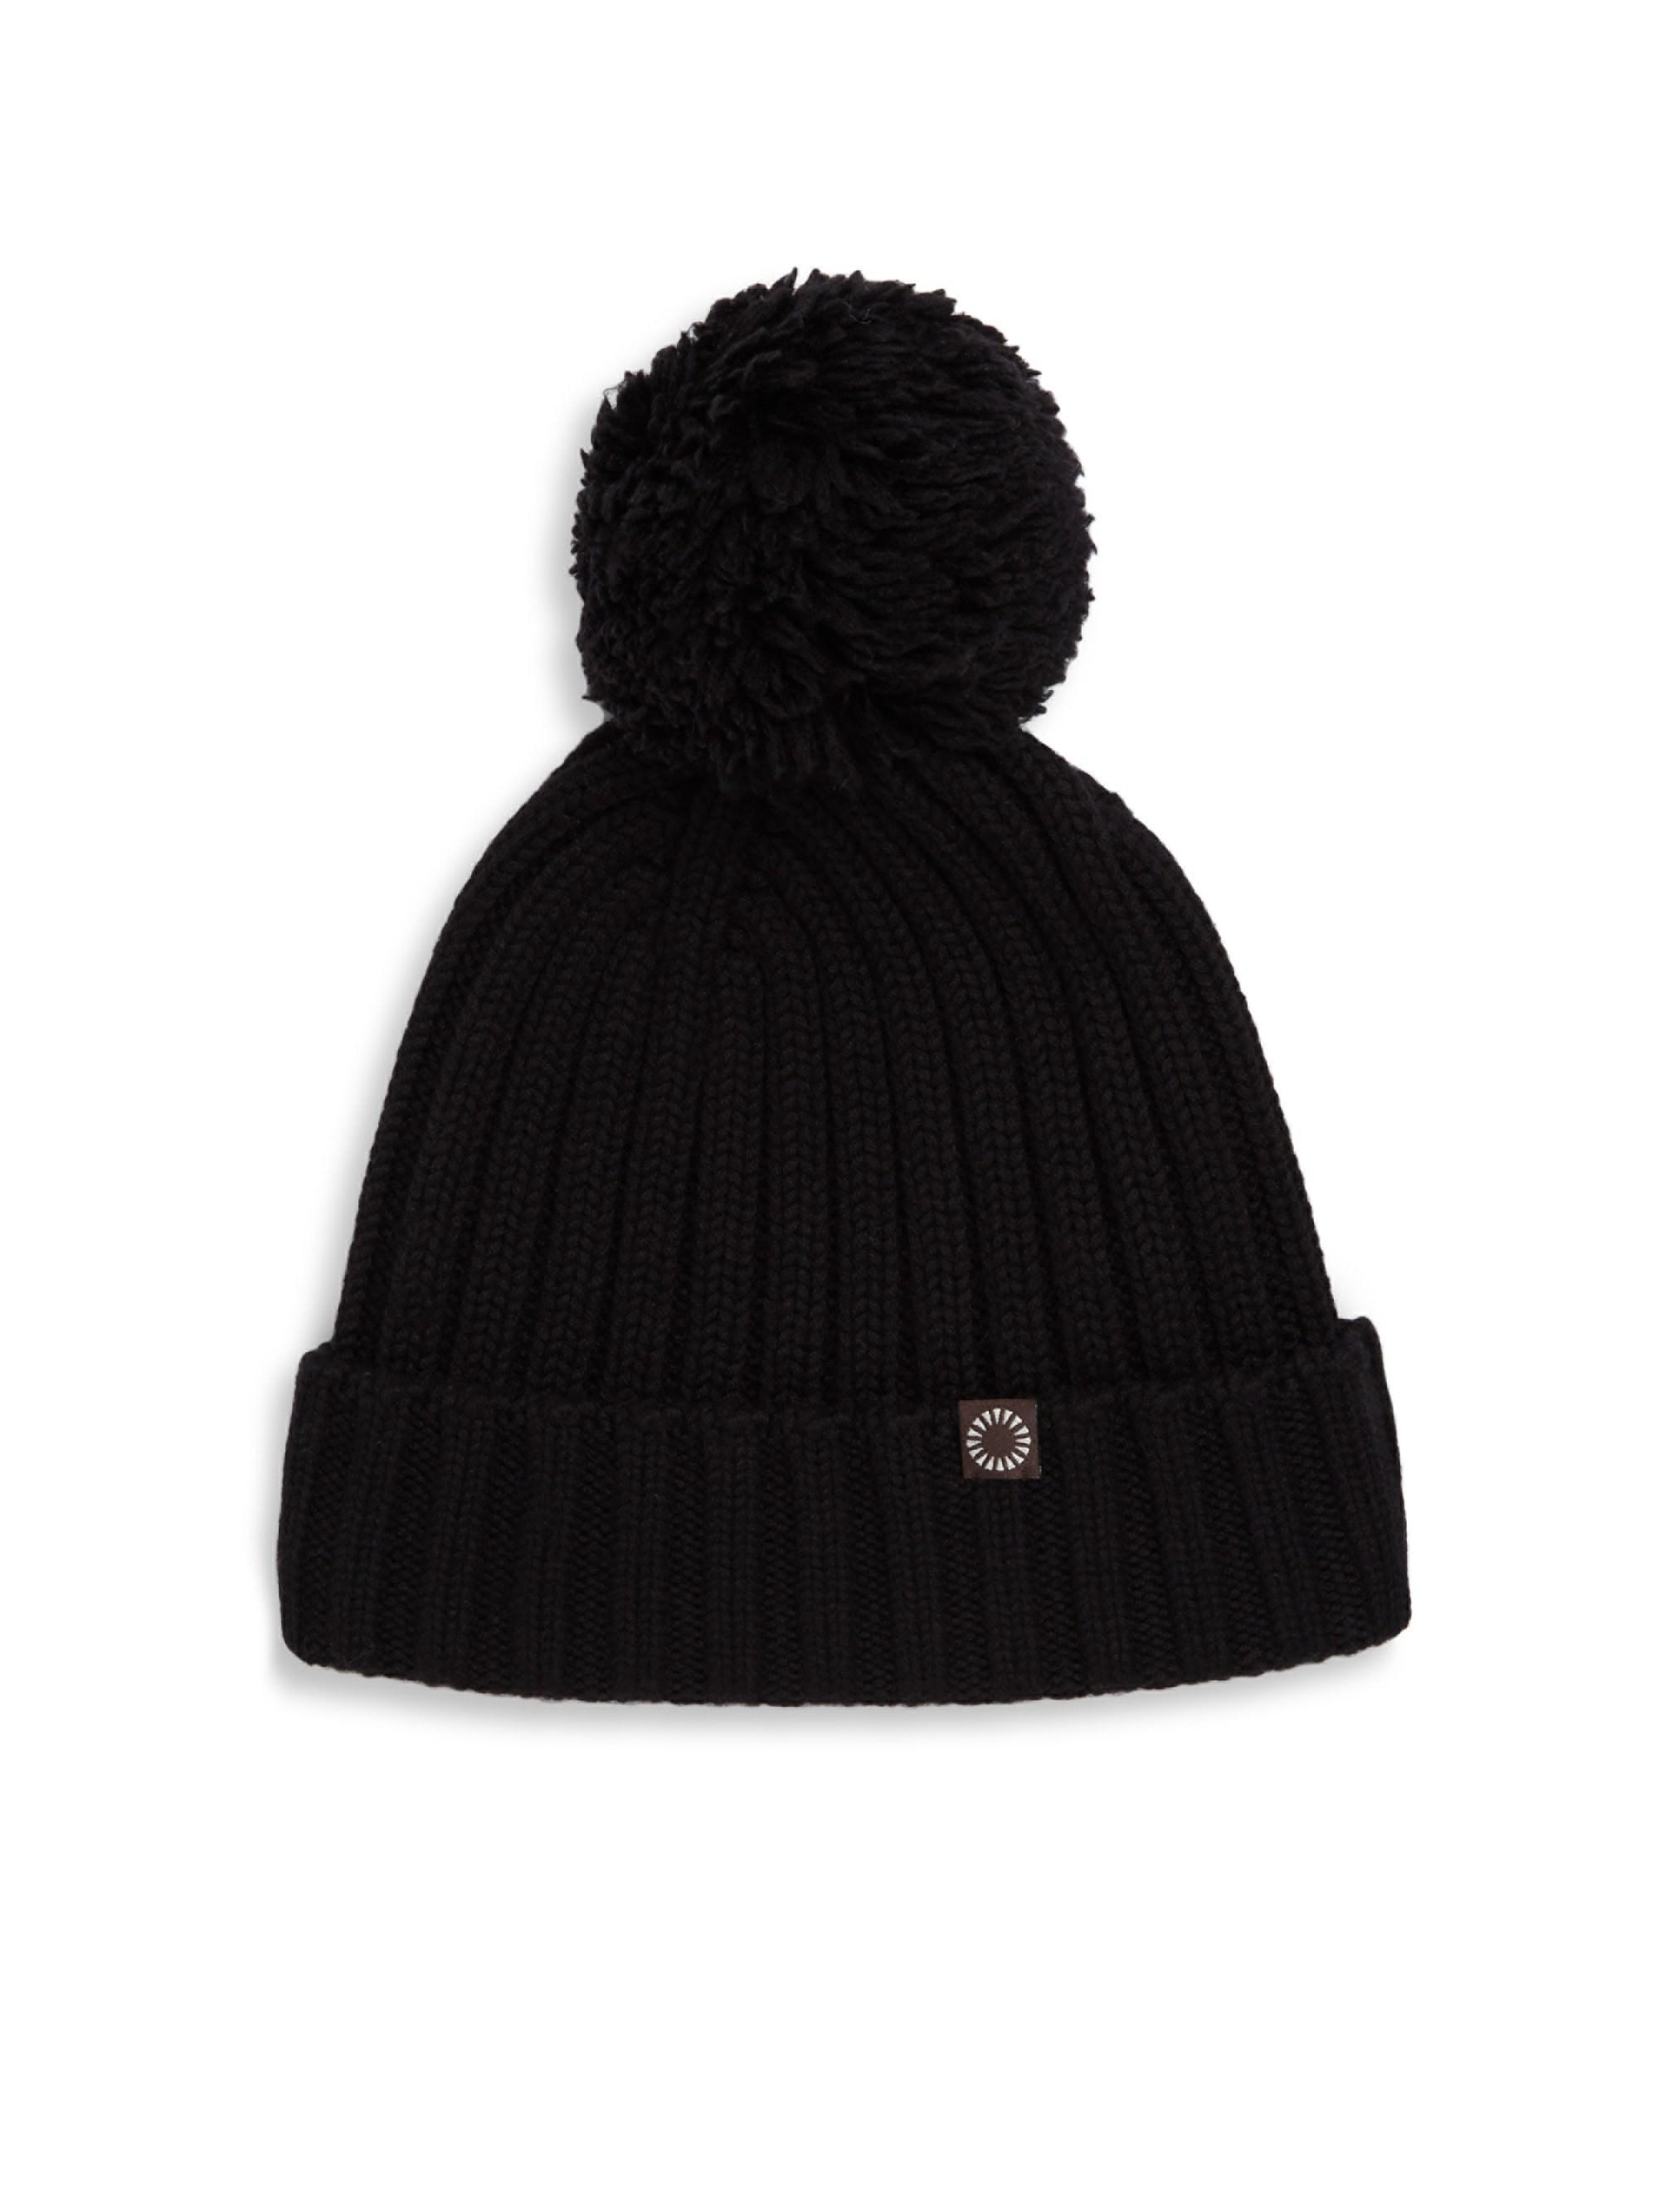 Ugg Ribbed-knit Pom-pom Beanie in Black - Lyst c248d50f4f32